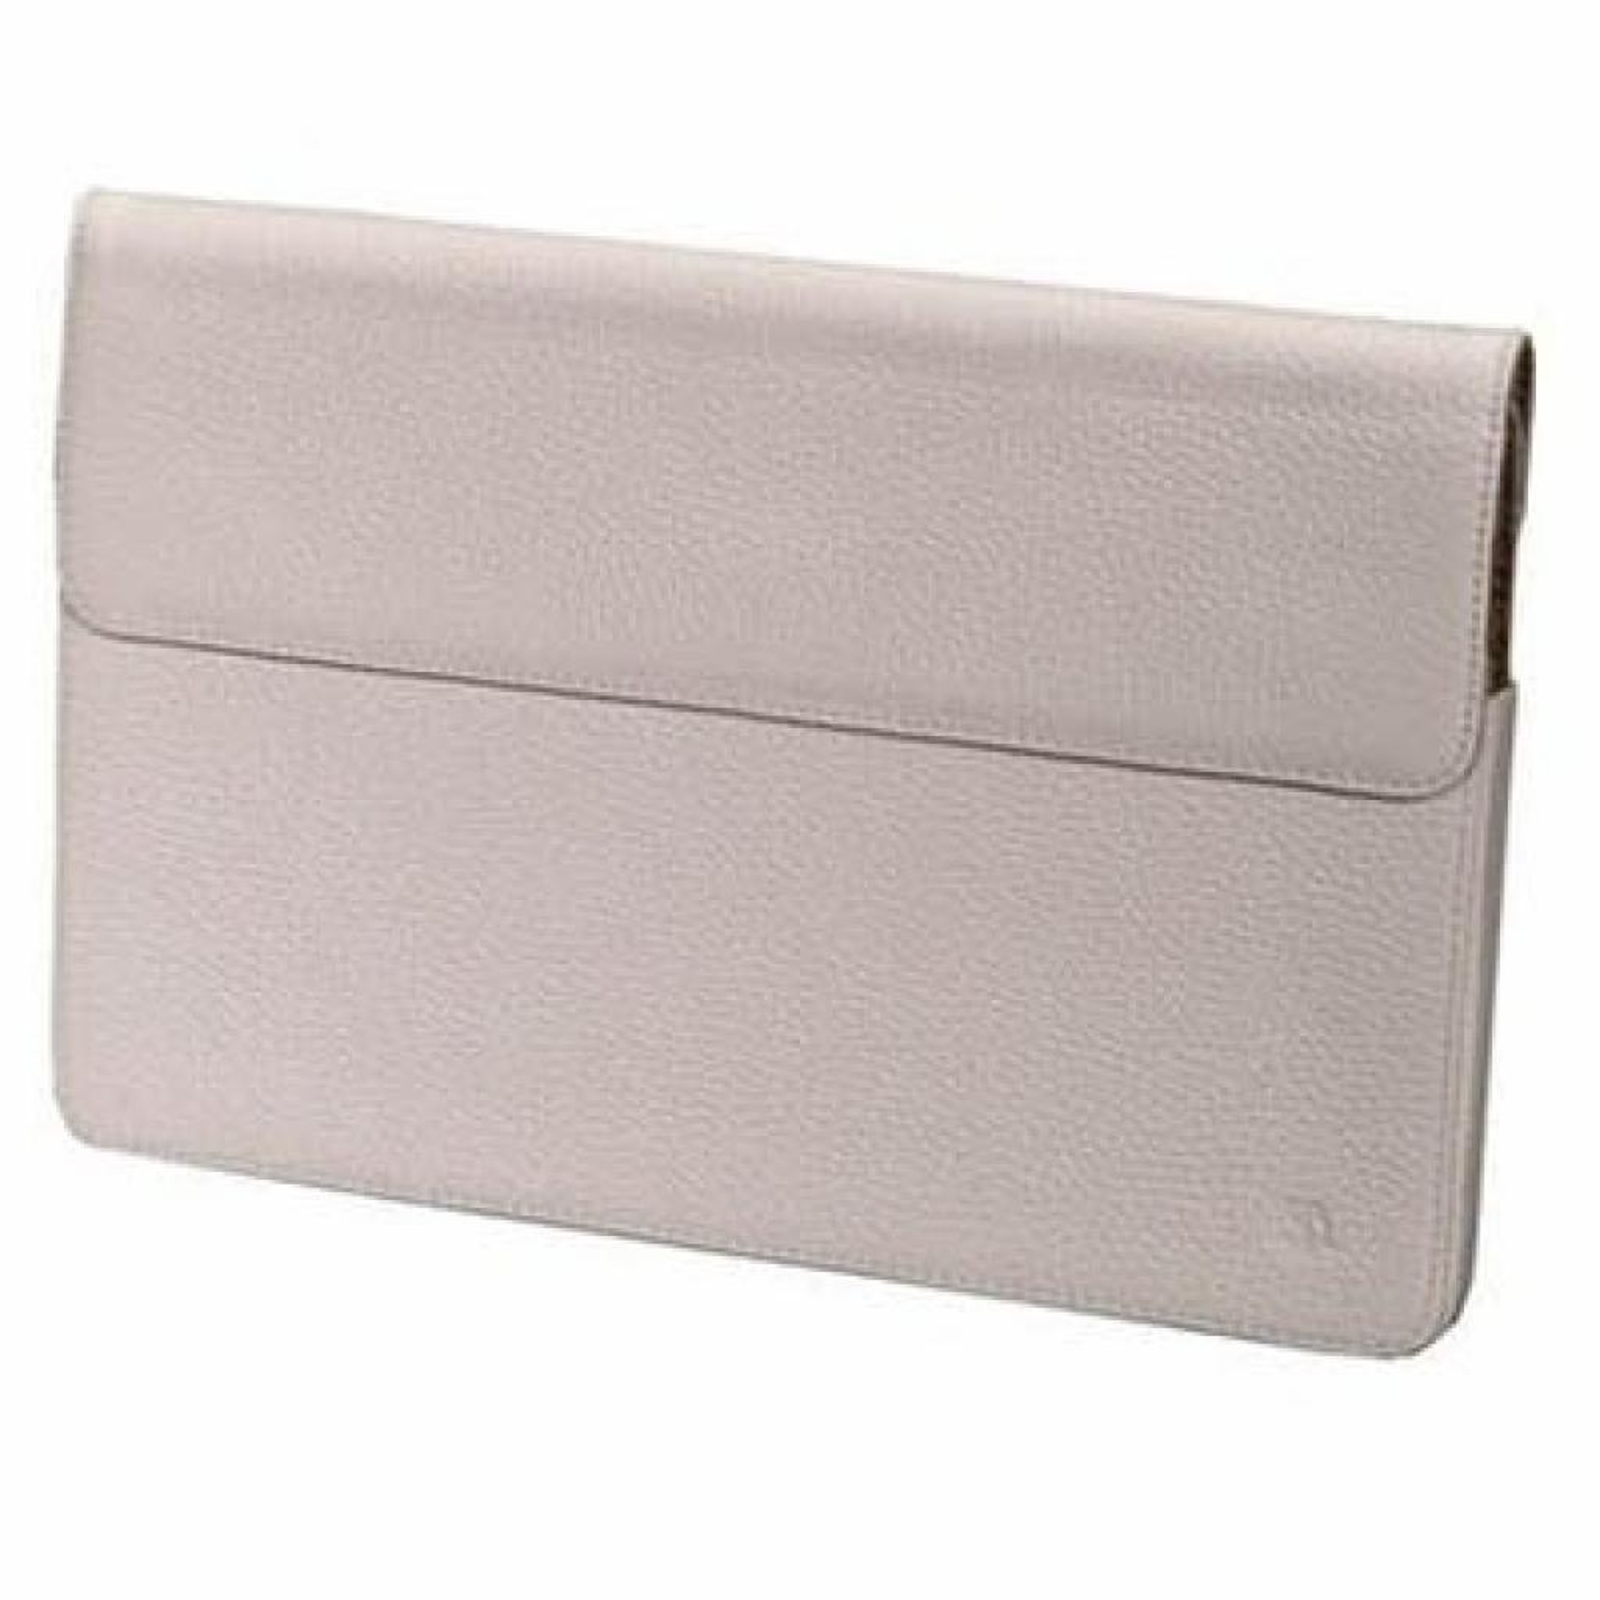 Чехол для планшета SB iPad Soft case (white) (324305)